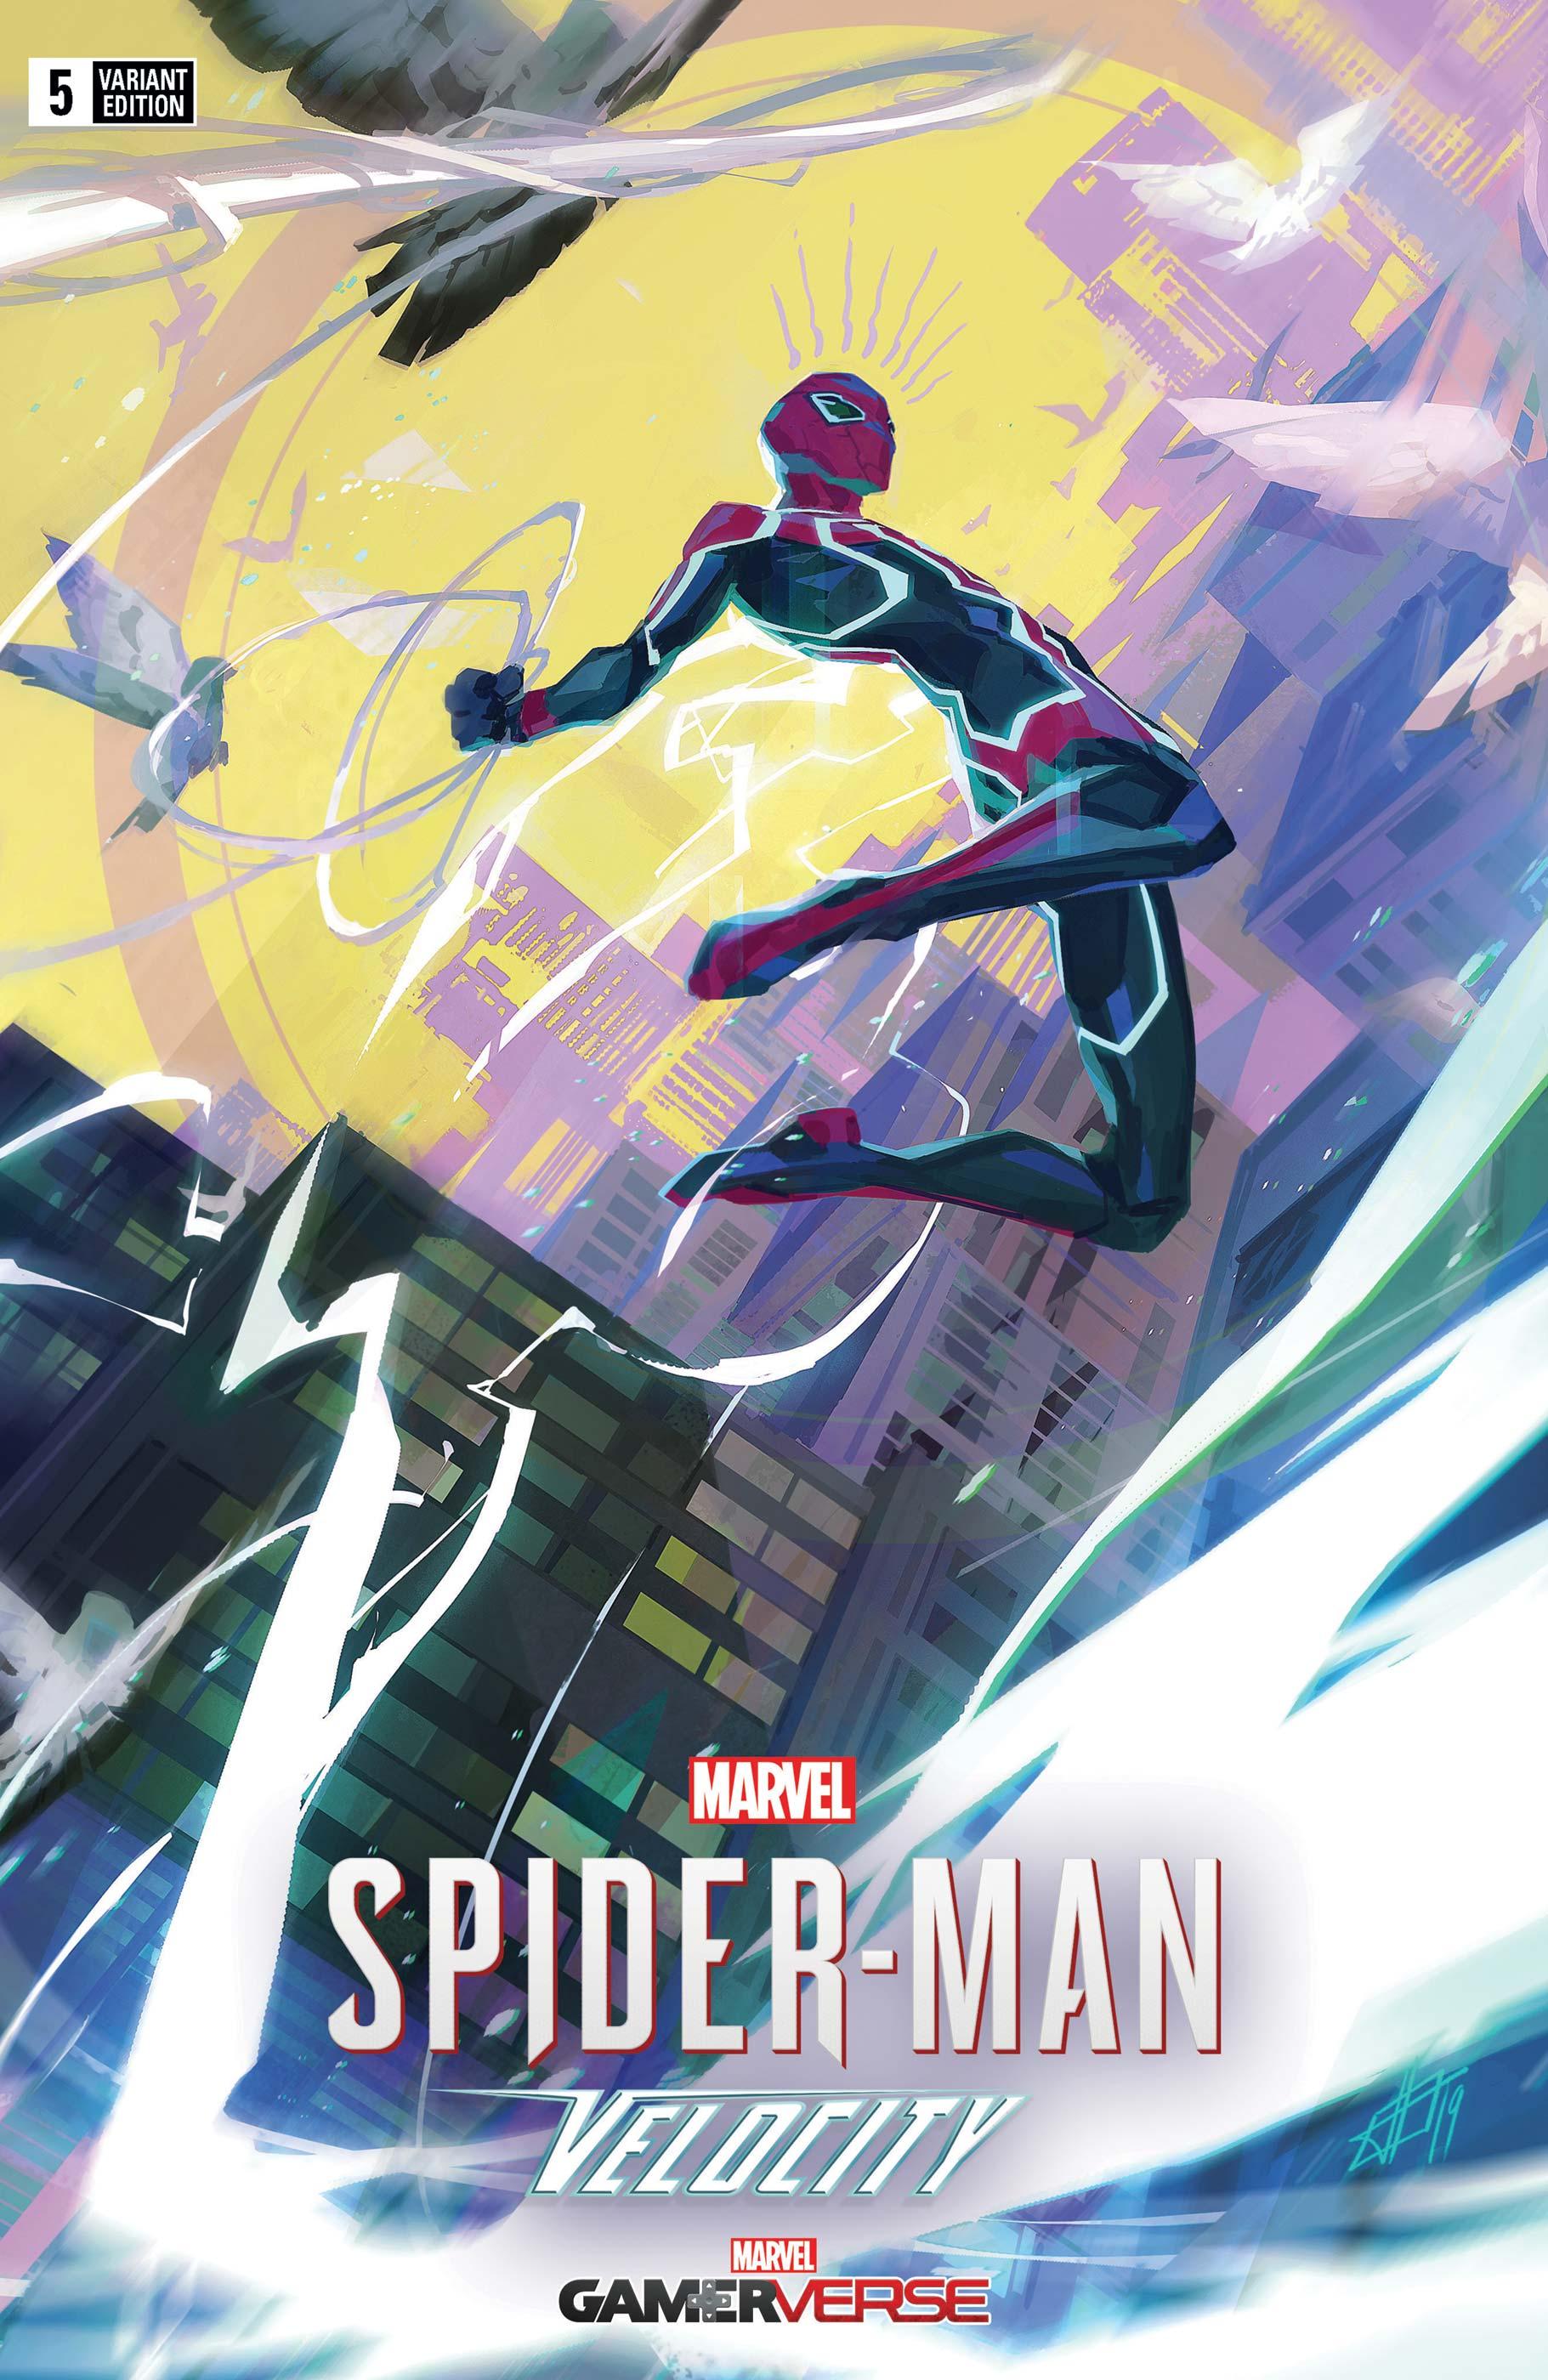 Marvel's Spider-Man: Velocity (2019) #5 (Variant)